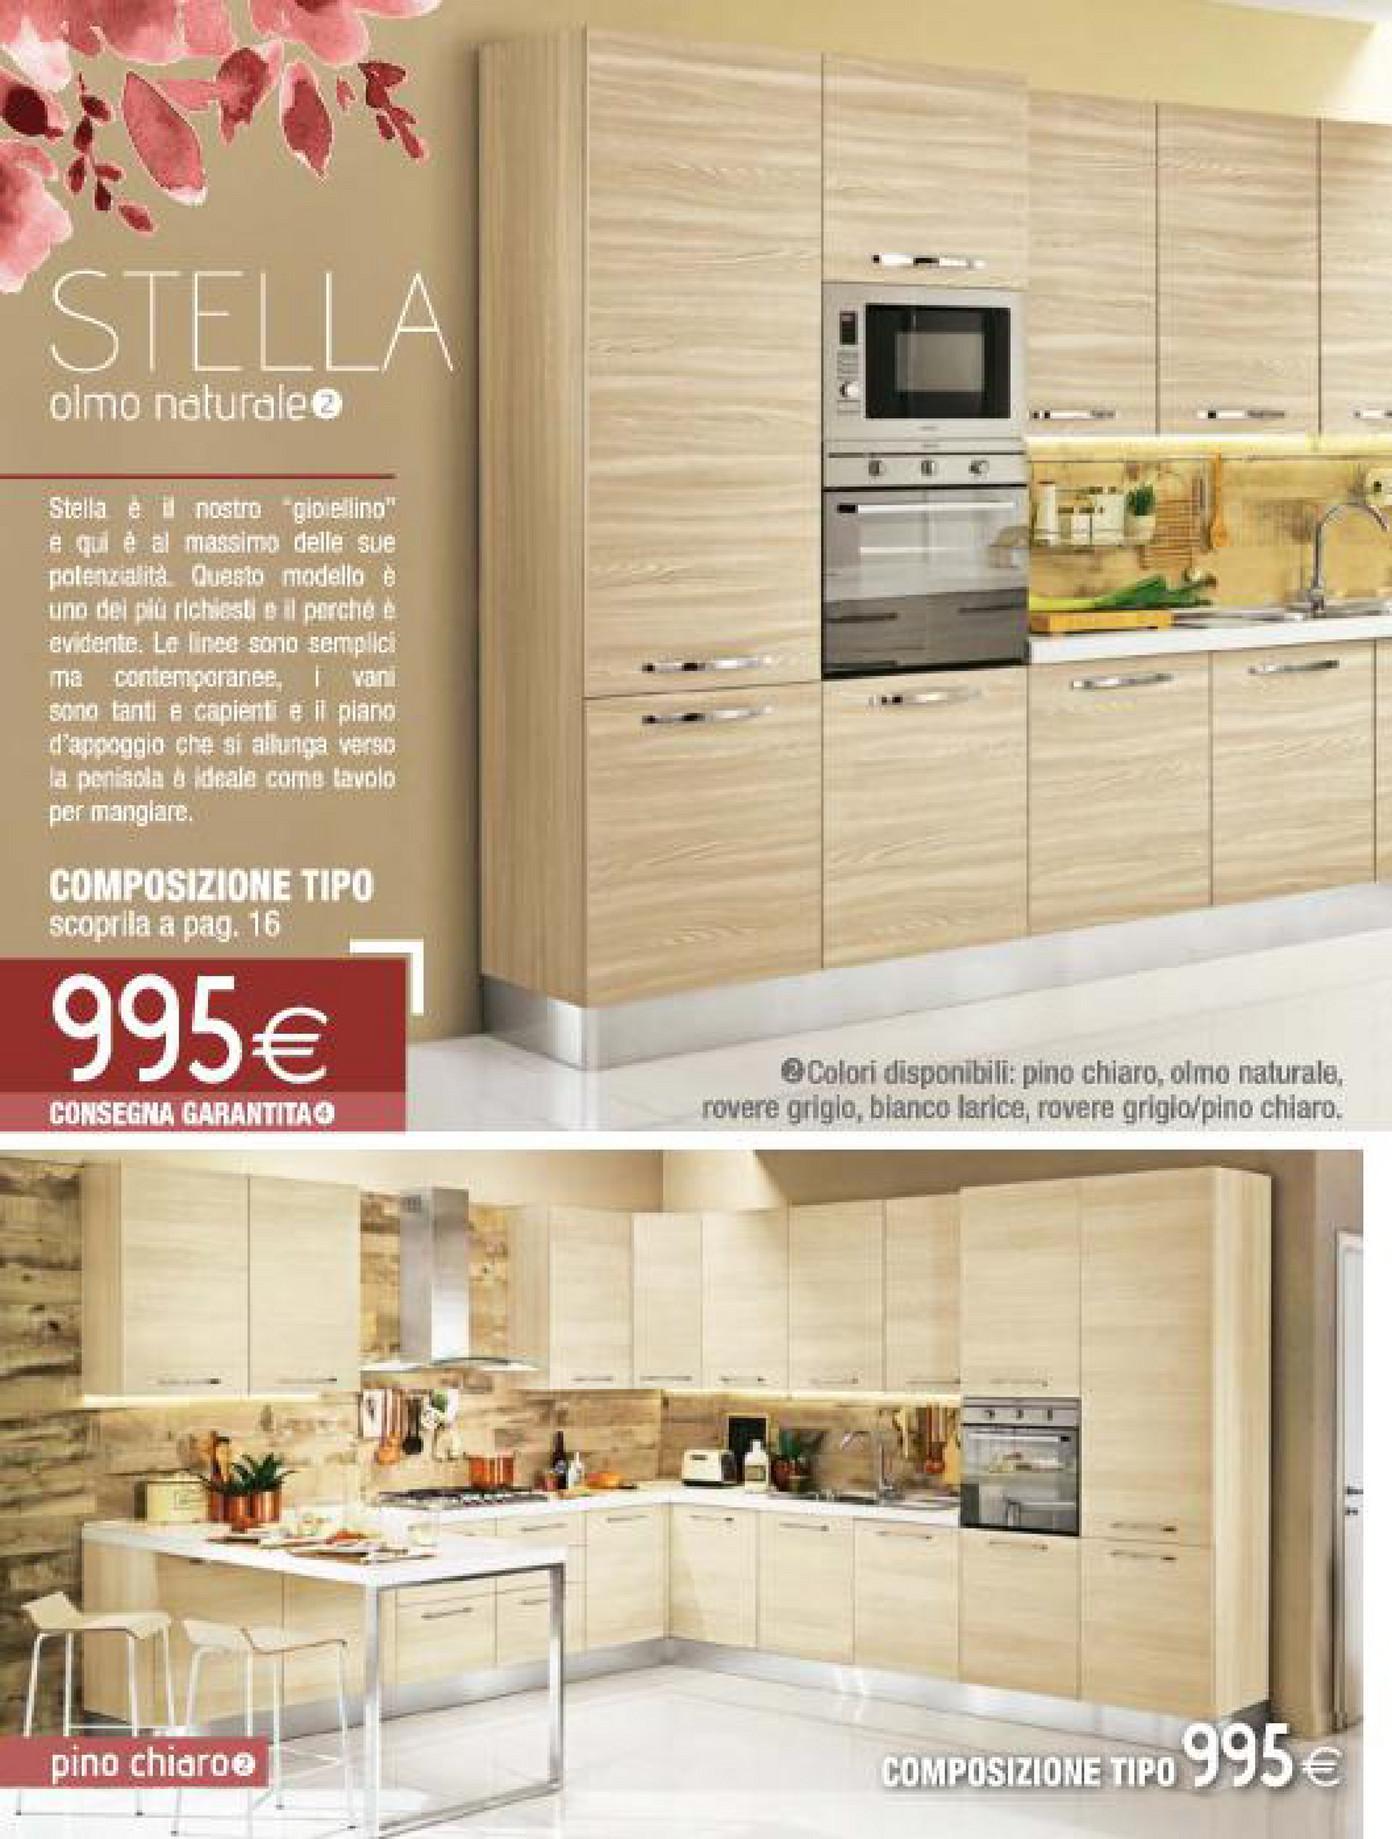 Catalogo Mondo Convenienza. Cucina Stella Mondo Convenienza With ...